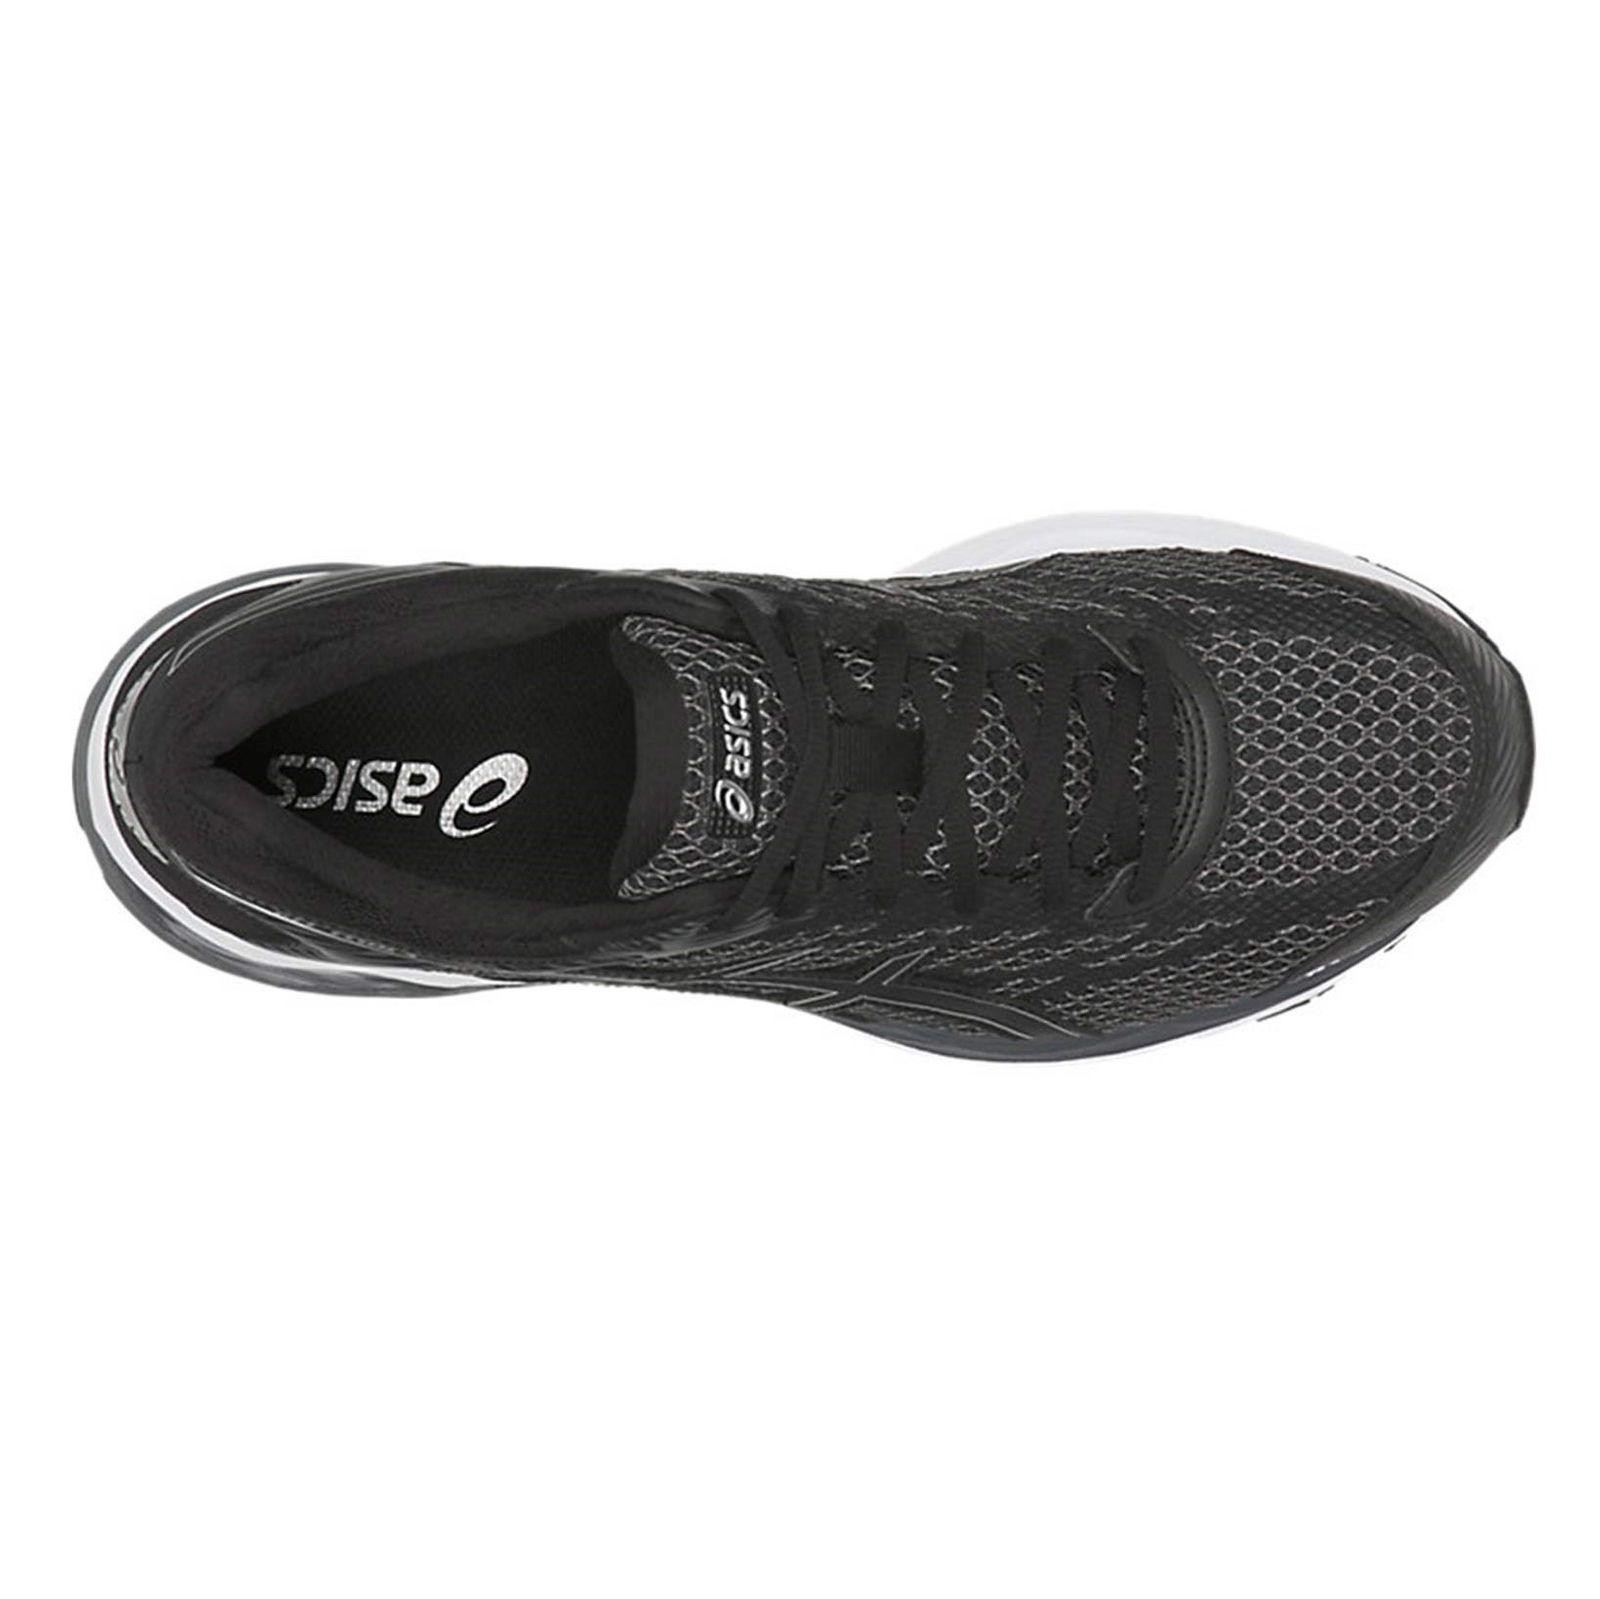 کفش دویدن بندی مردانه GEL-FLUX 4 - اسیکس - مشکي - 2